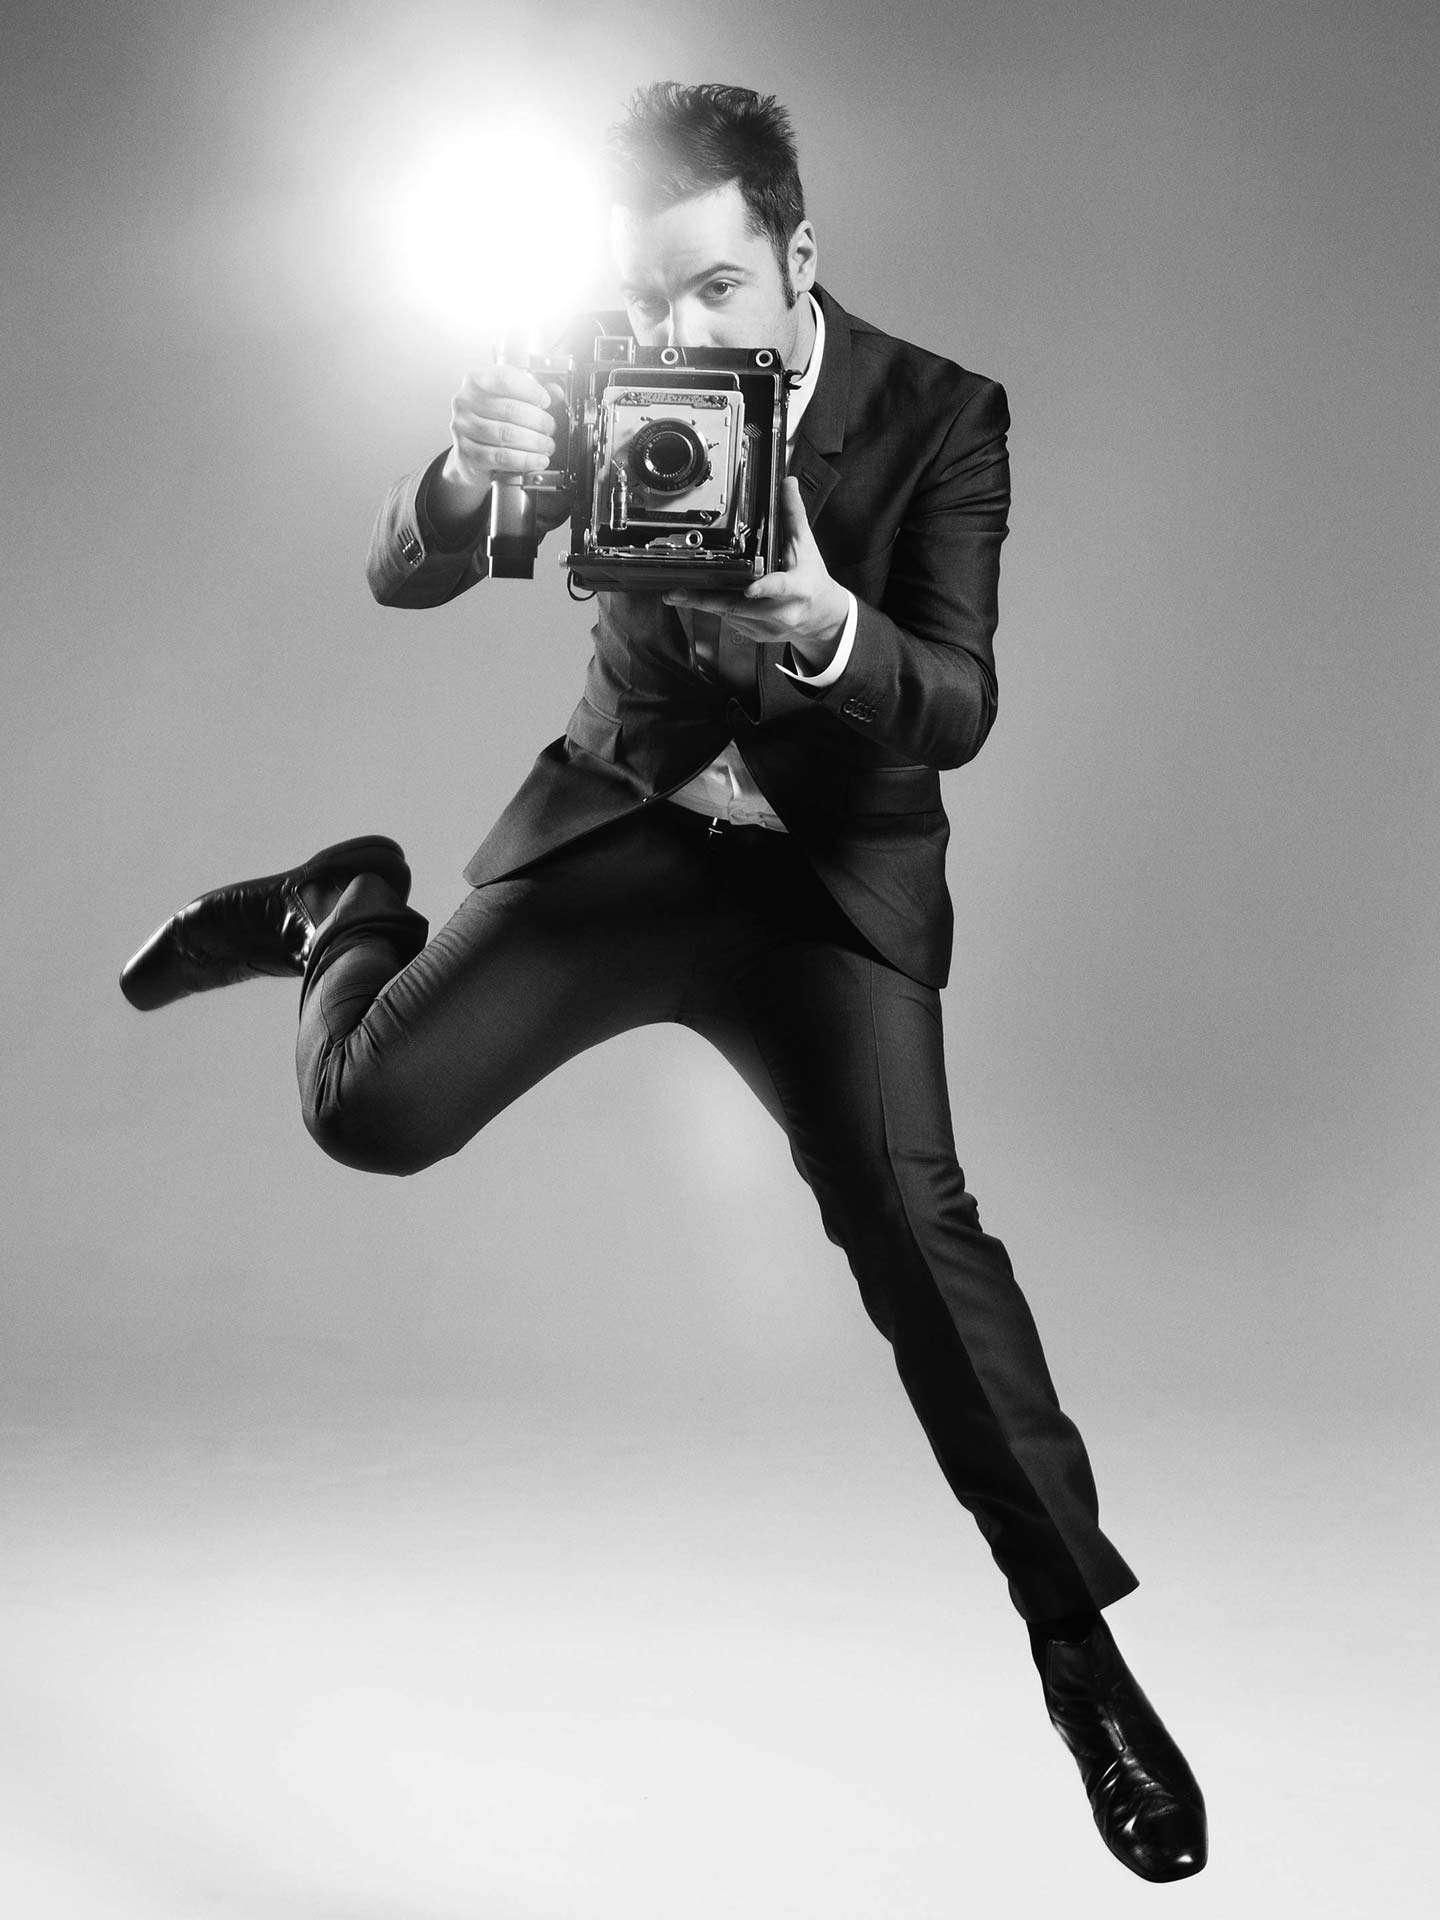 man jumping holding old school camera by Jocelyn Michel